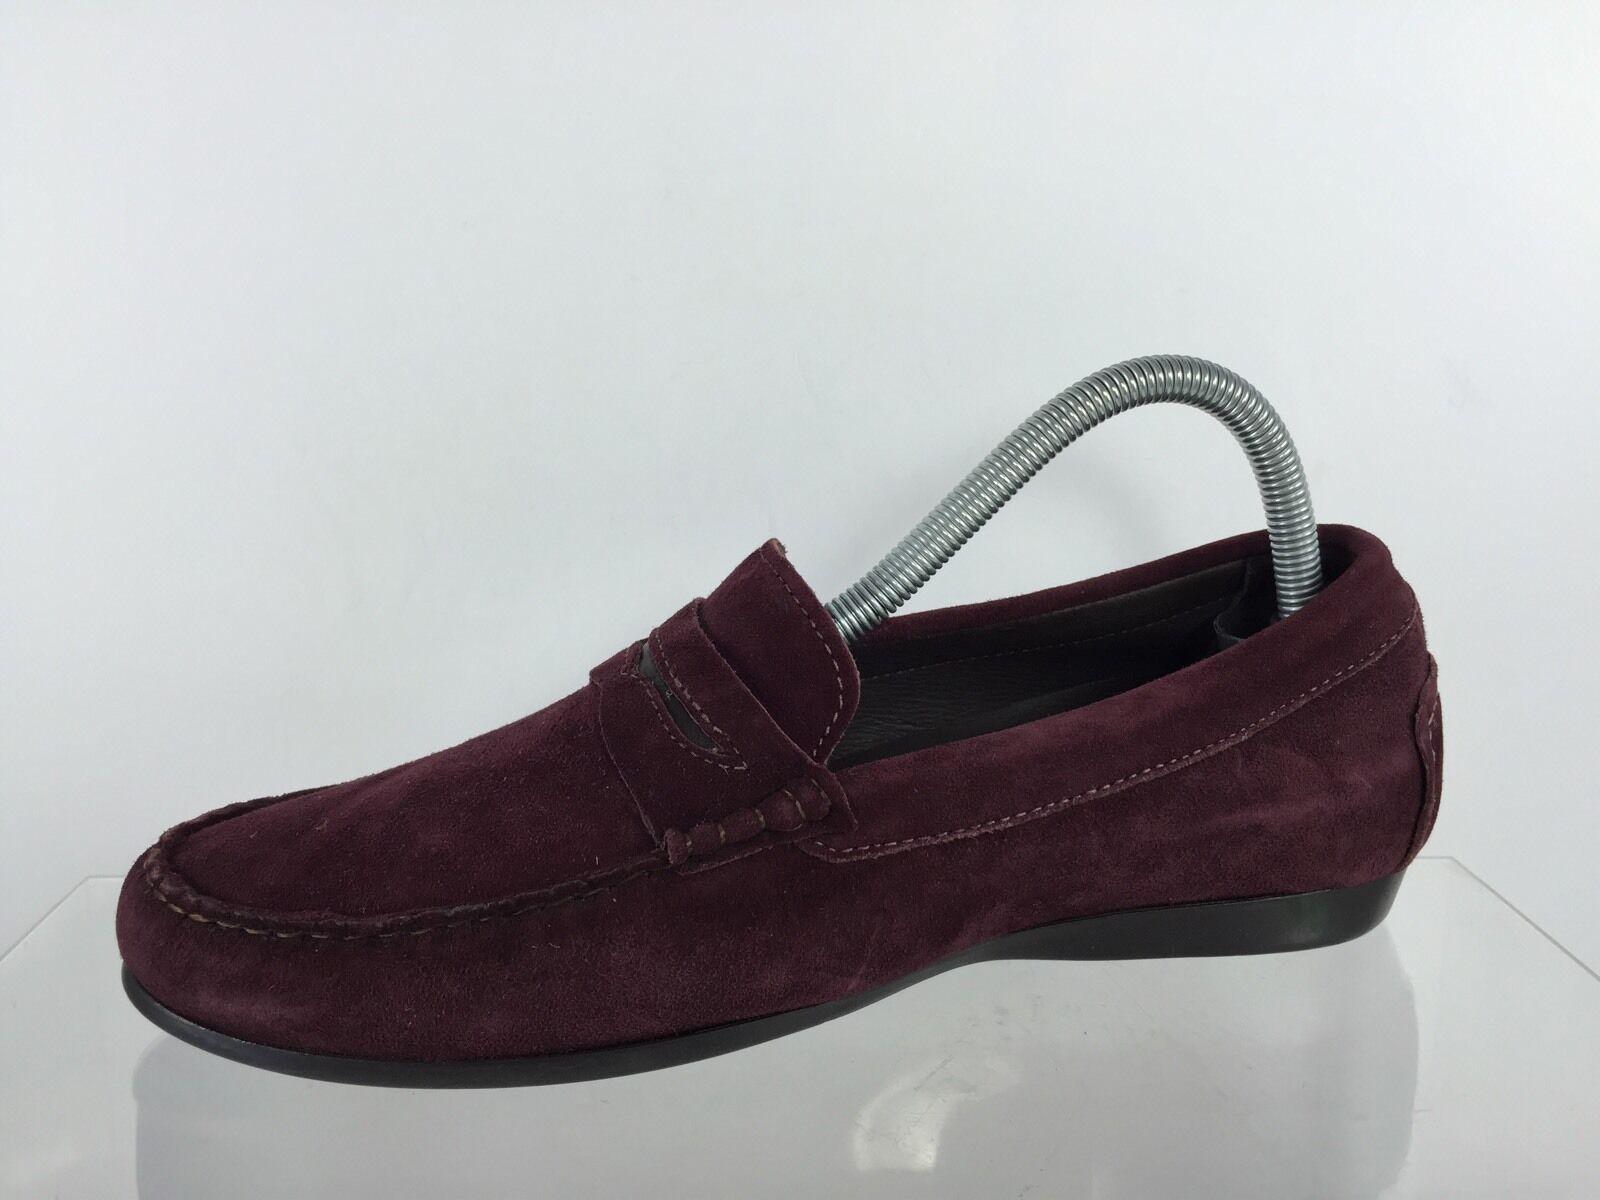 Zapatos de cuero Munro Borgoña para mujer 8 8 8 W  para mayoristas